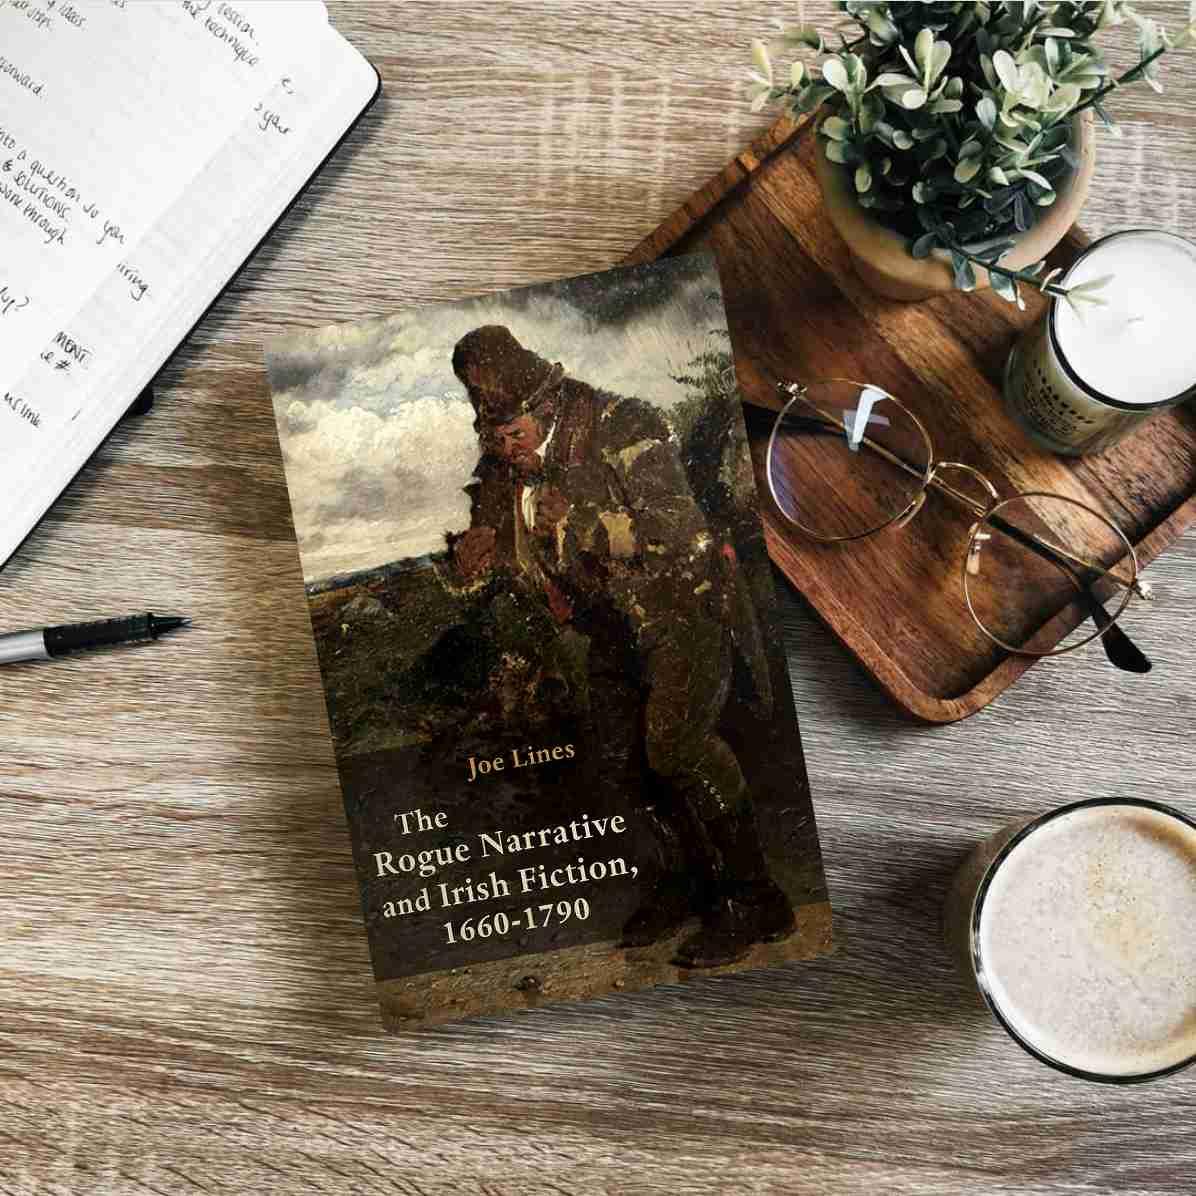 the-rogue-narrative-and-irish-fiction